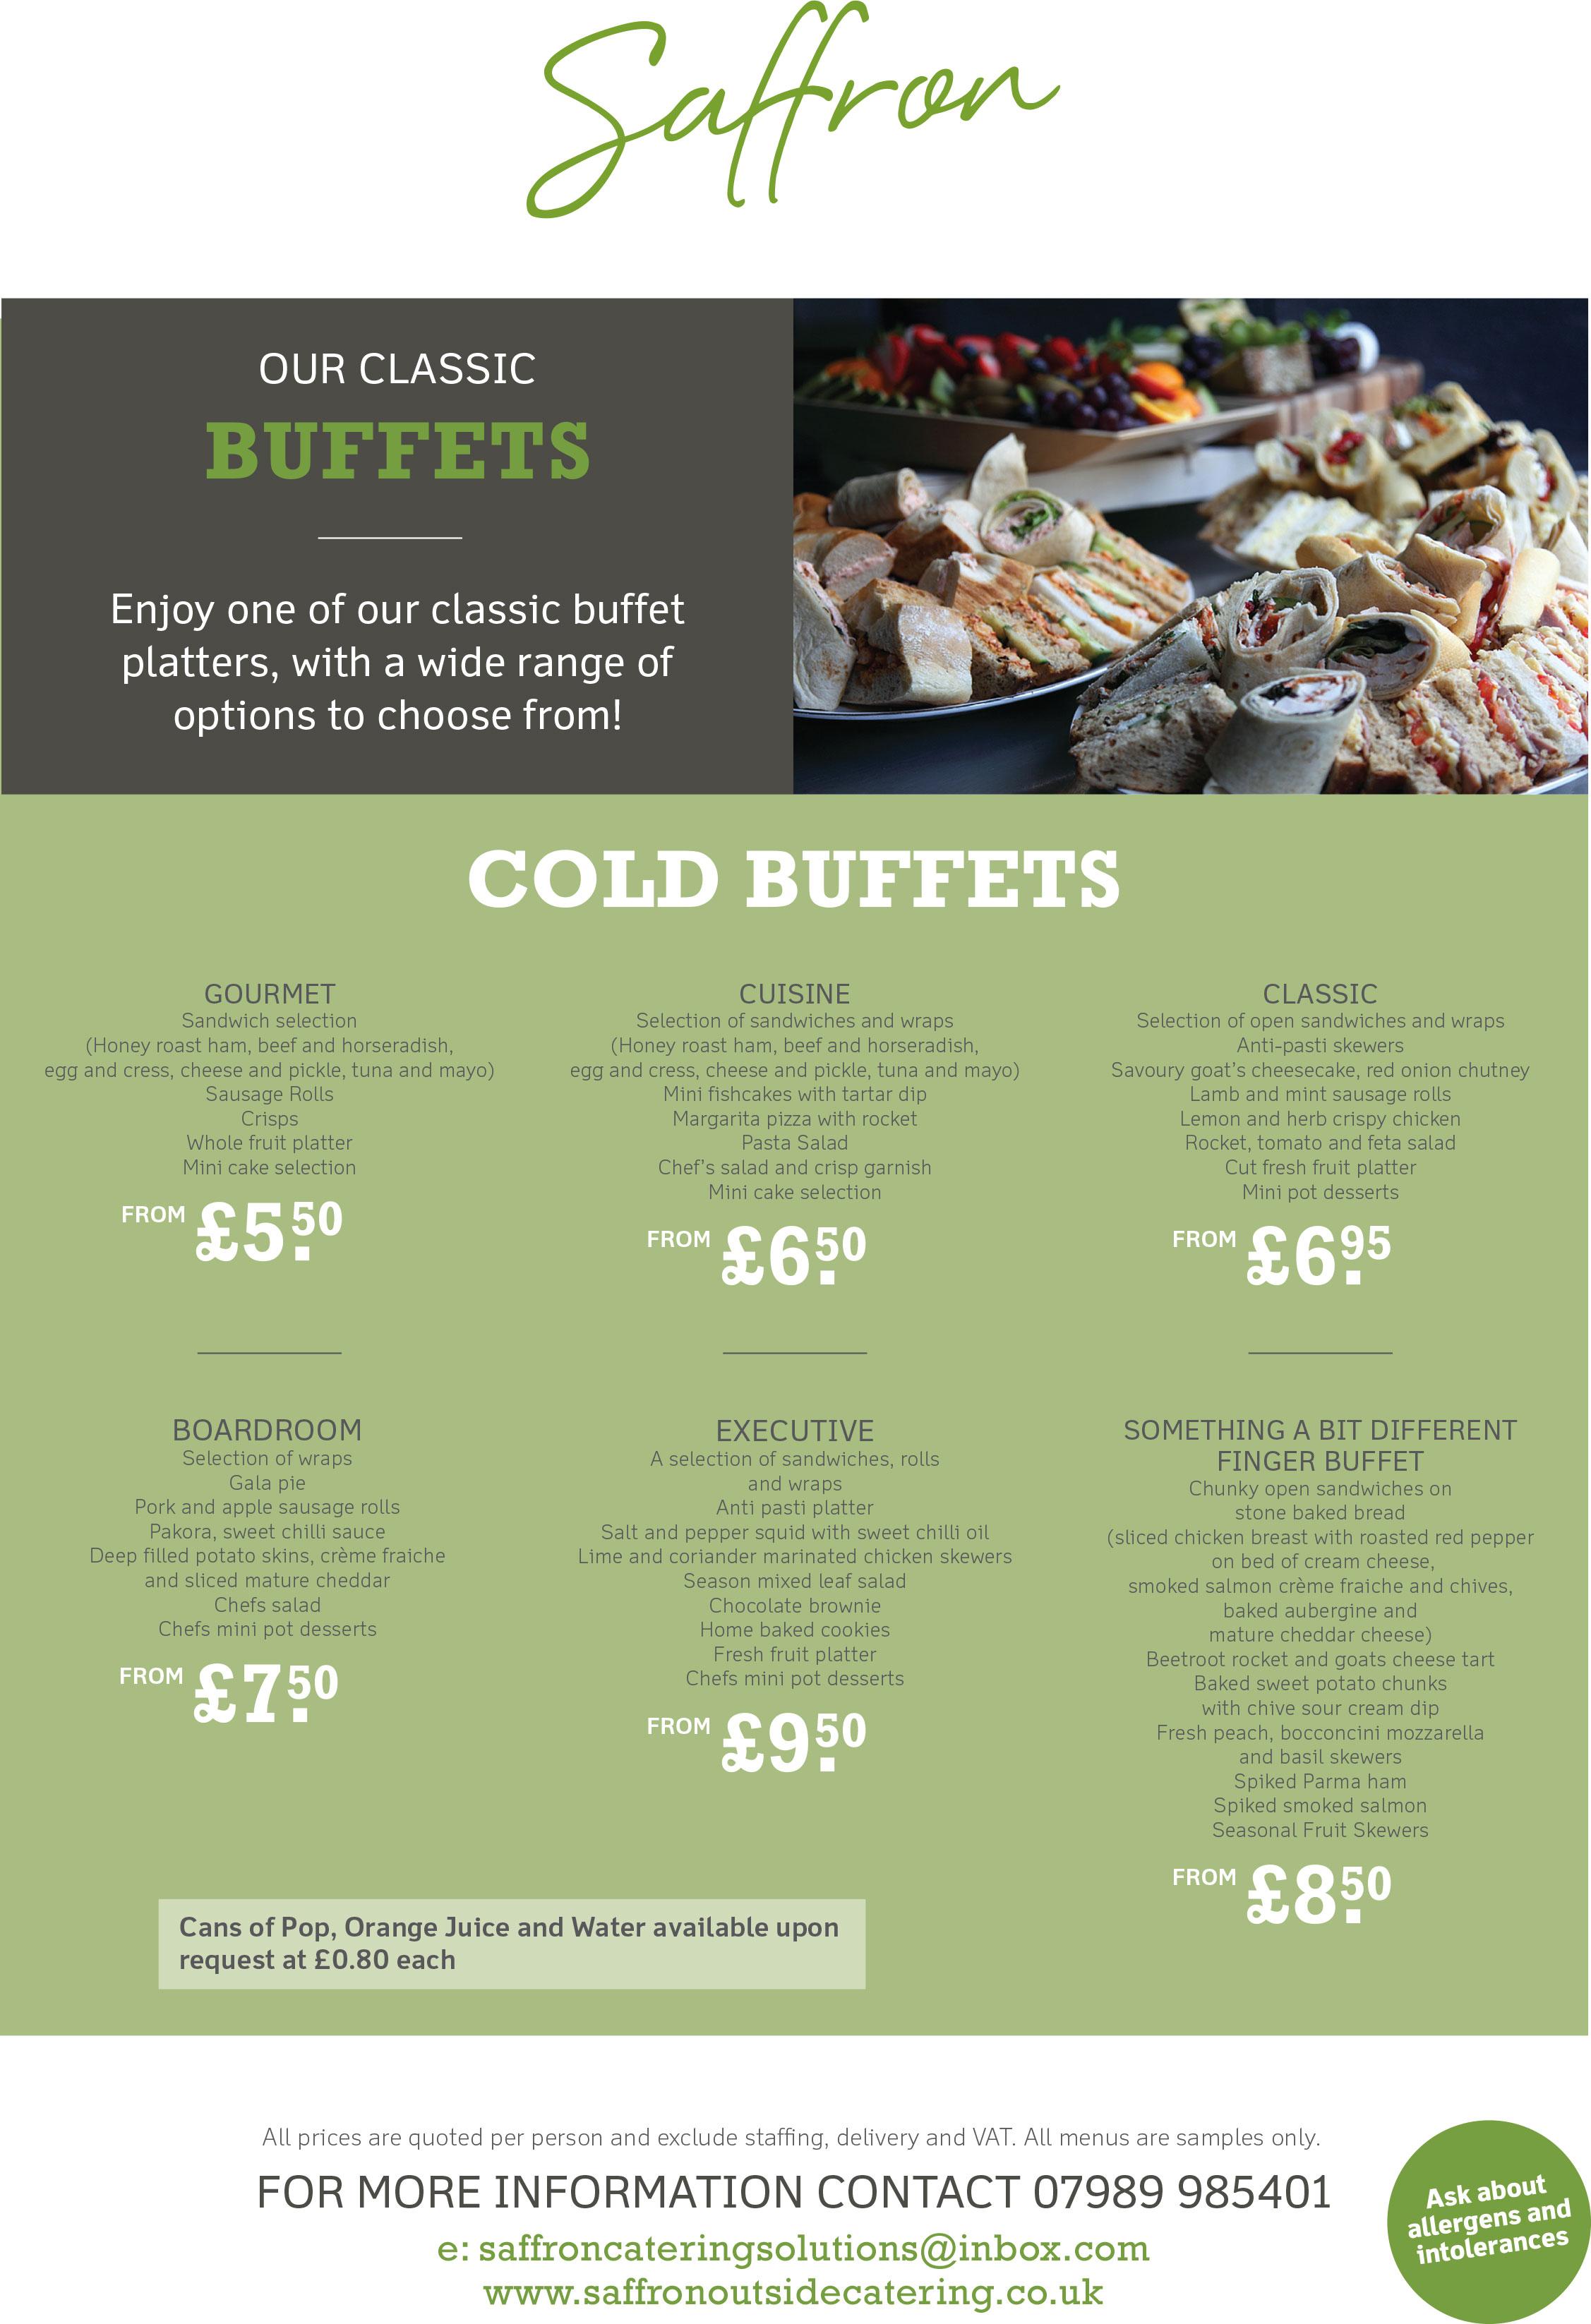 COLD BUFFETS - Cold Buffet Menu